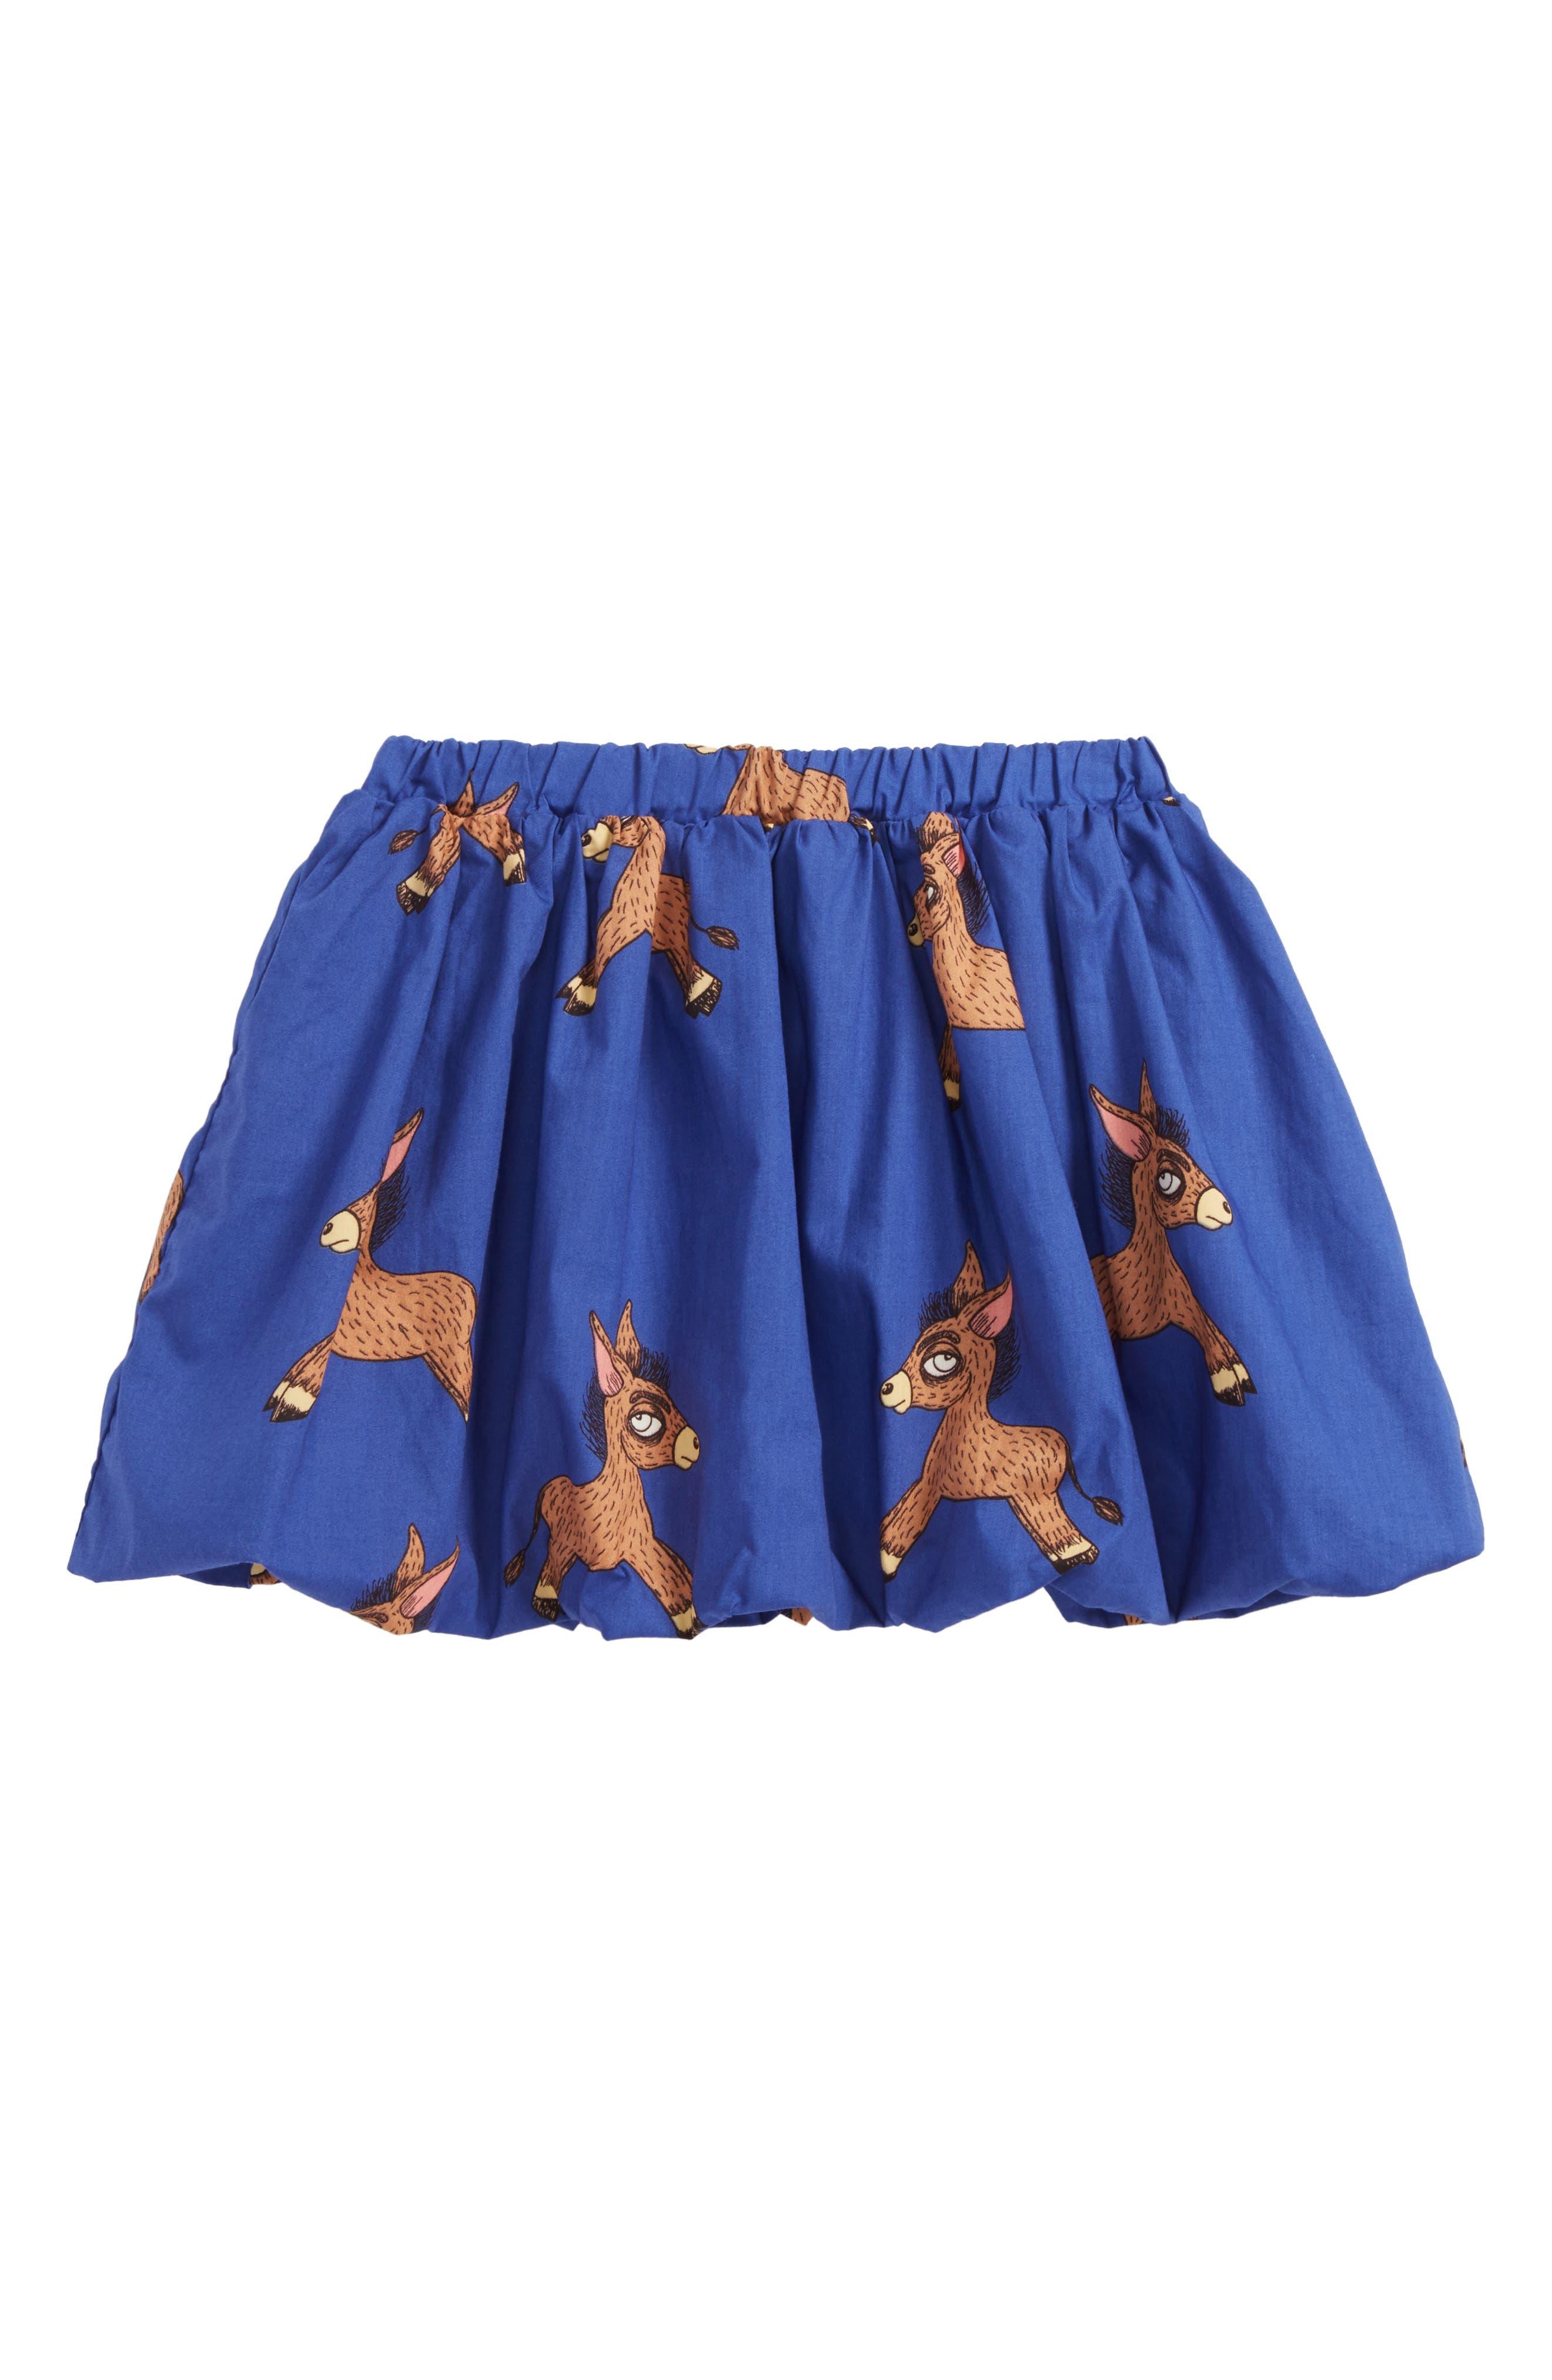 Donkey Print Woven Organic Cotton Balloon Skirt,                         Main,                         color, 400